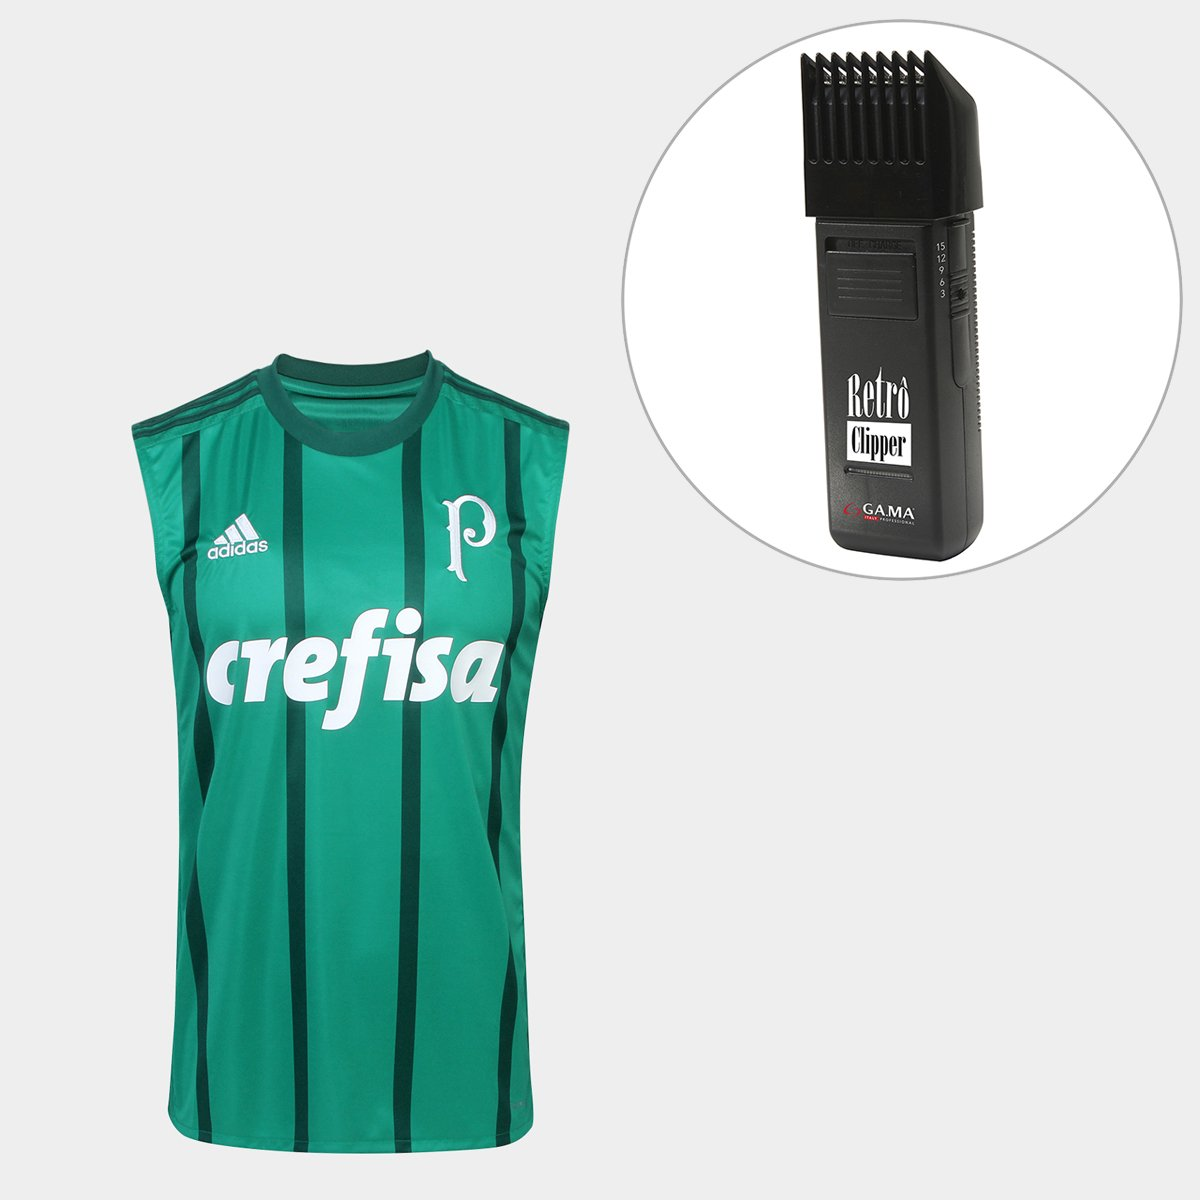 Kit Camisa Regata Palmeiras I 17 18 s nº Torcedor Adidas Masculina +  Maquina Retrô Gama Italy Bivolt - Compre Agora  e24afd5383908